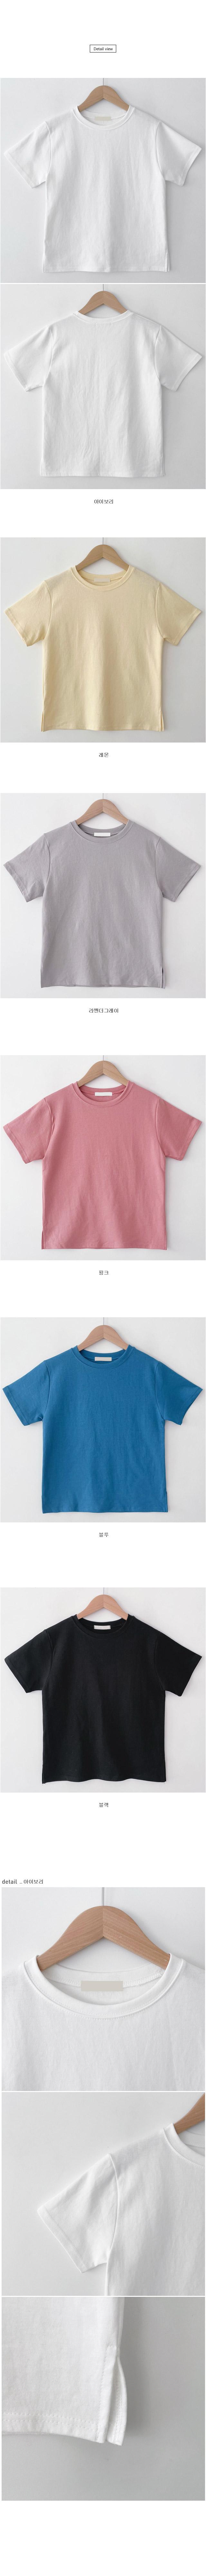 Tok Tok Basic Short-sleeved T-shirt